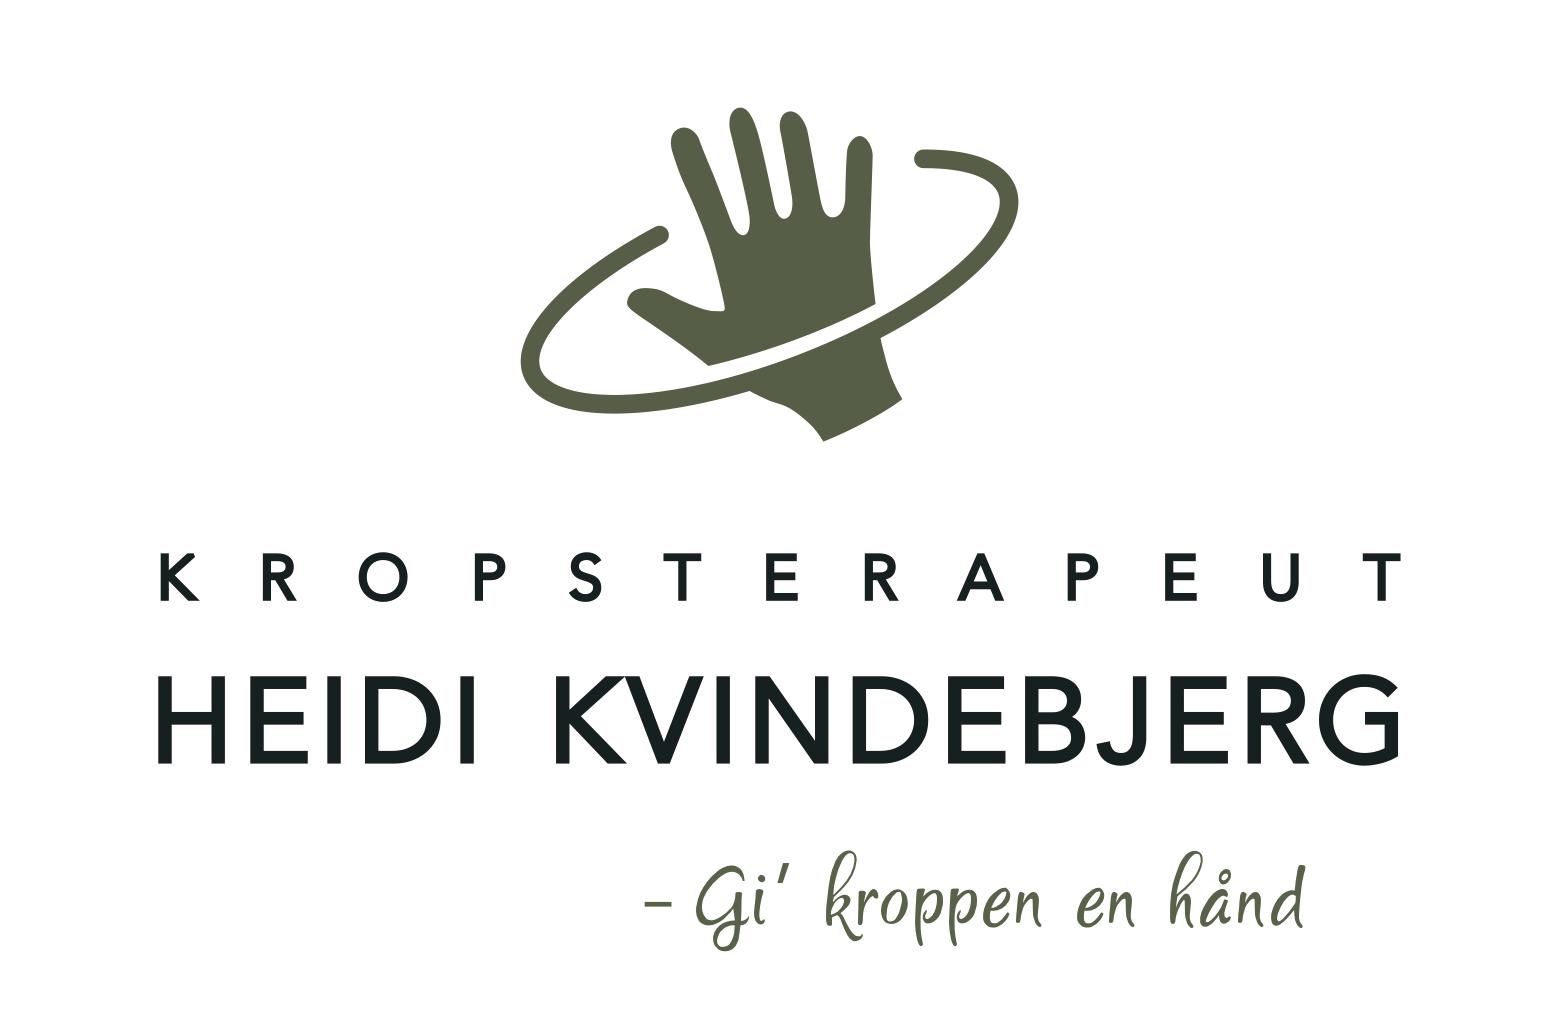 Kropsterapeut Heidi Kvindebjerg logo